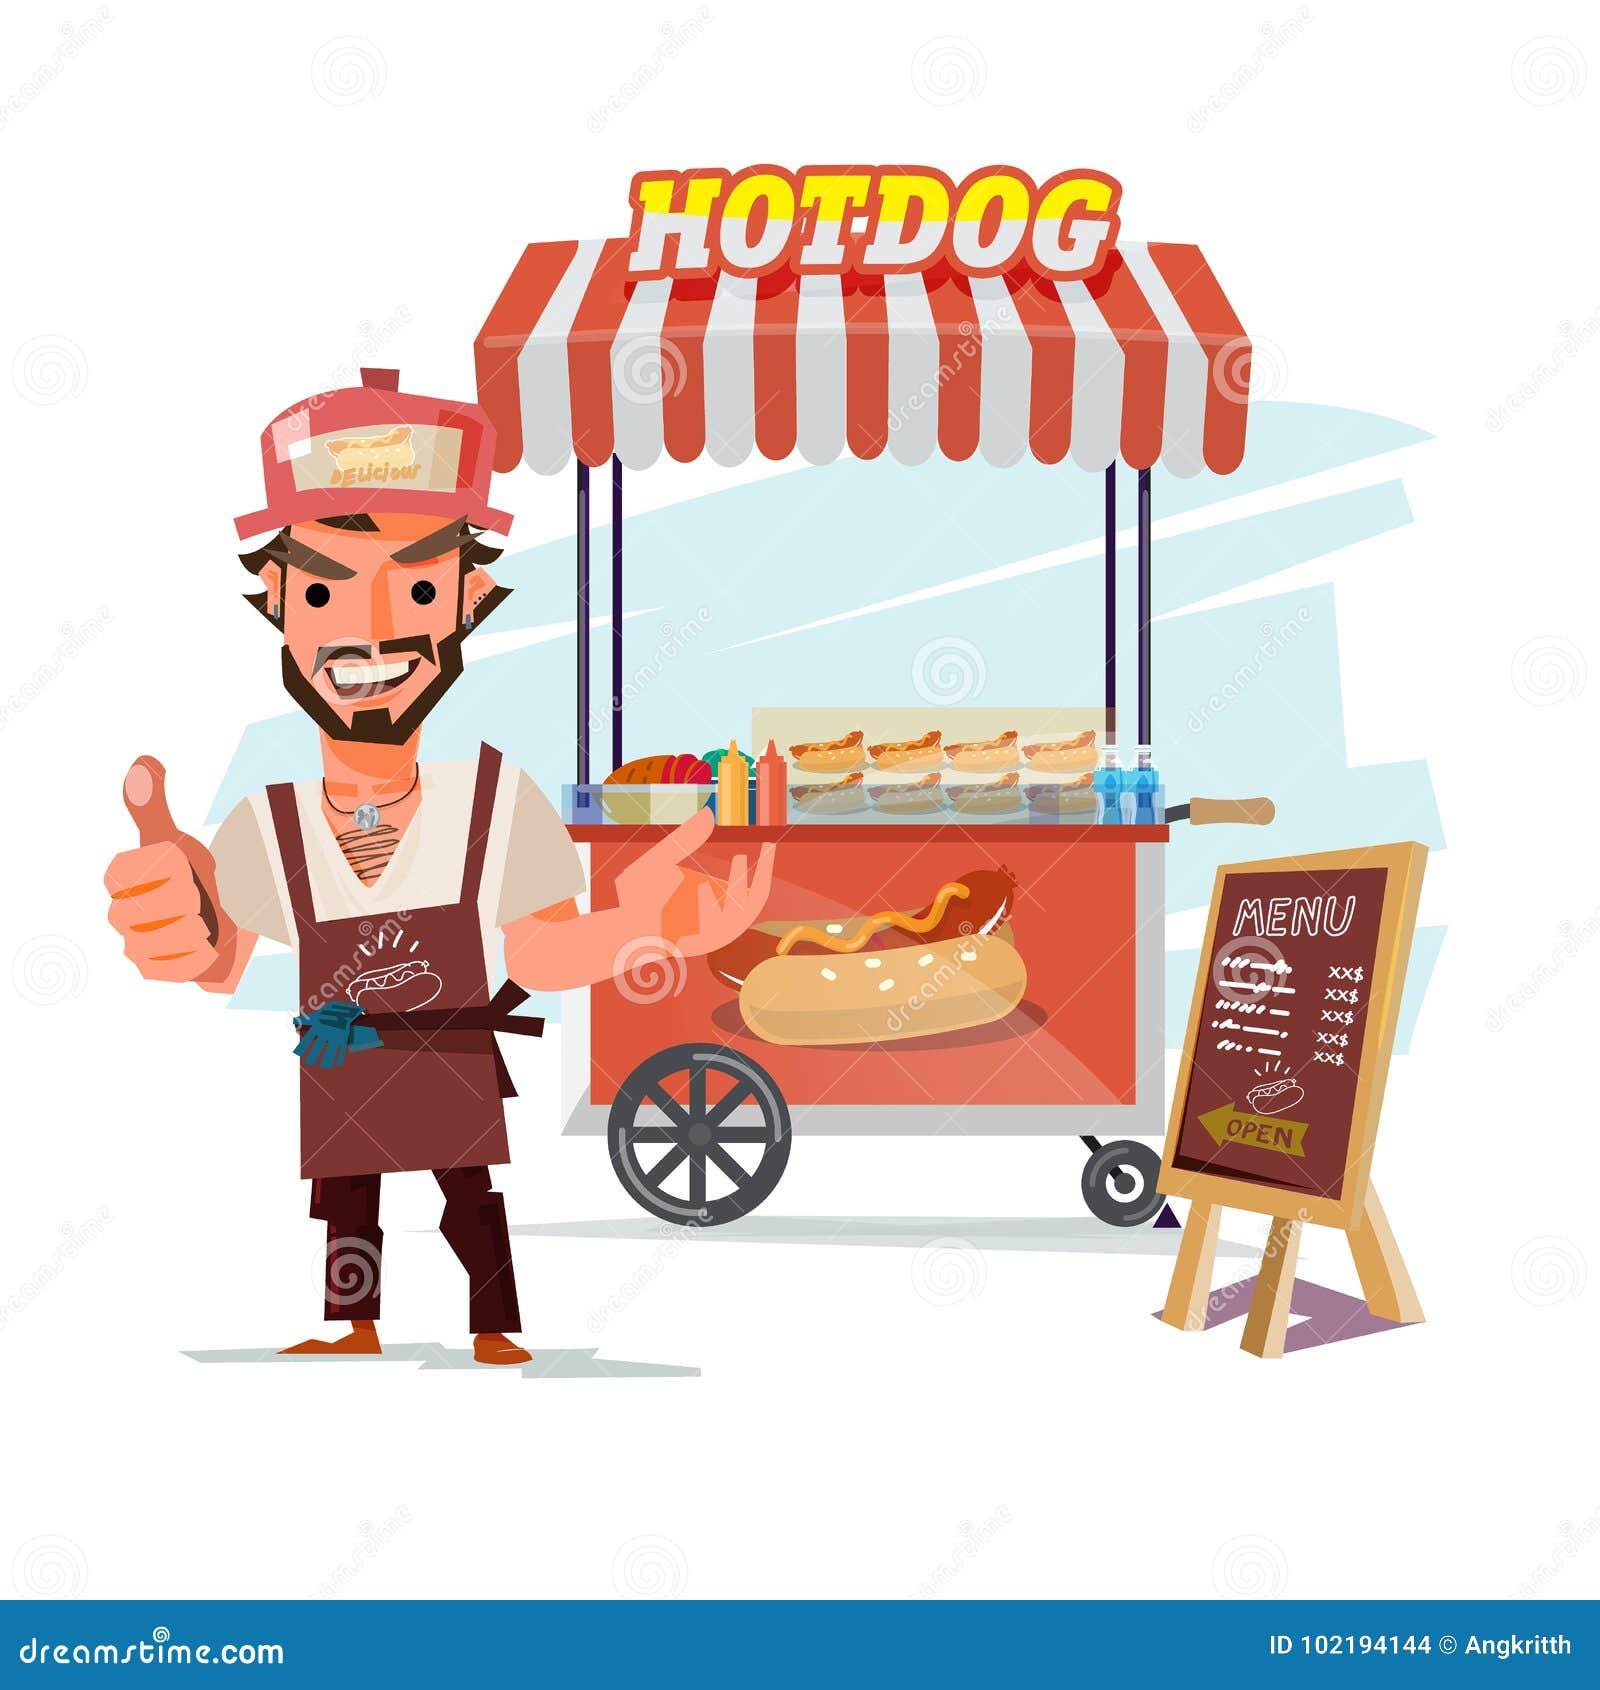 Hotdog Food Truck  Street Fodd With Merchant  Character Design